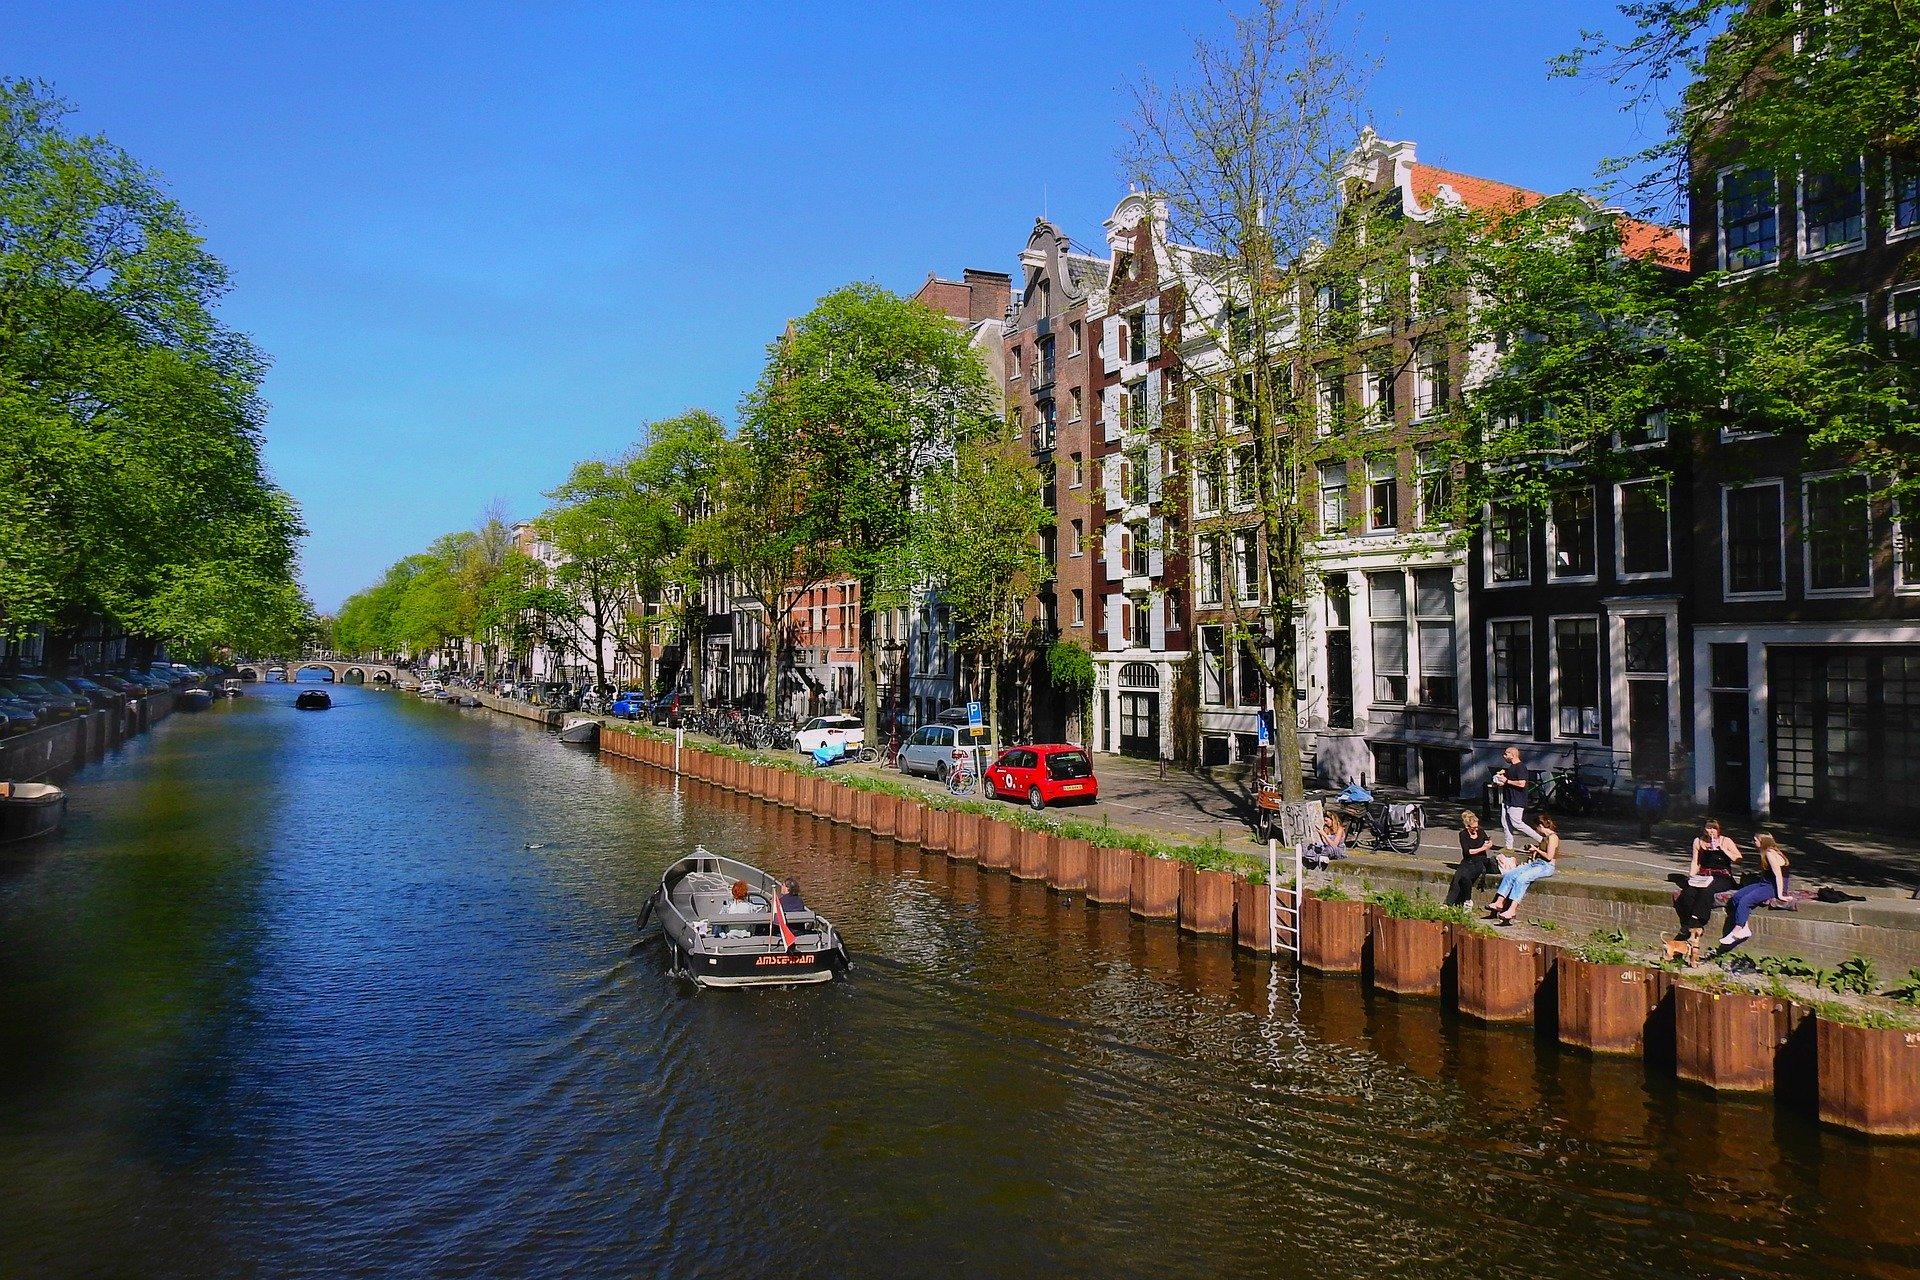 вакансии в нидерландах